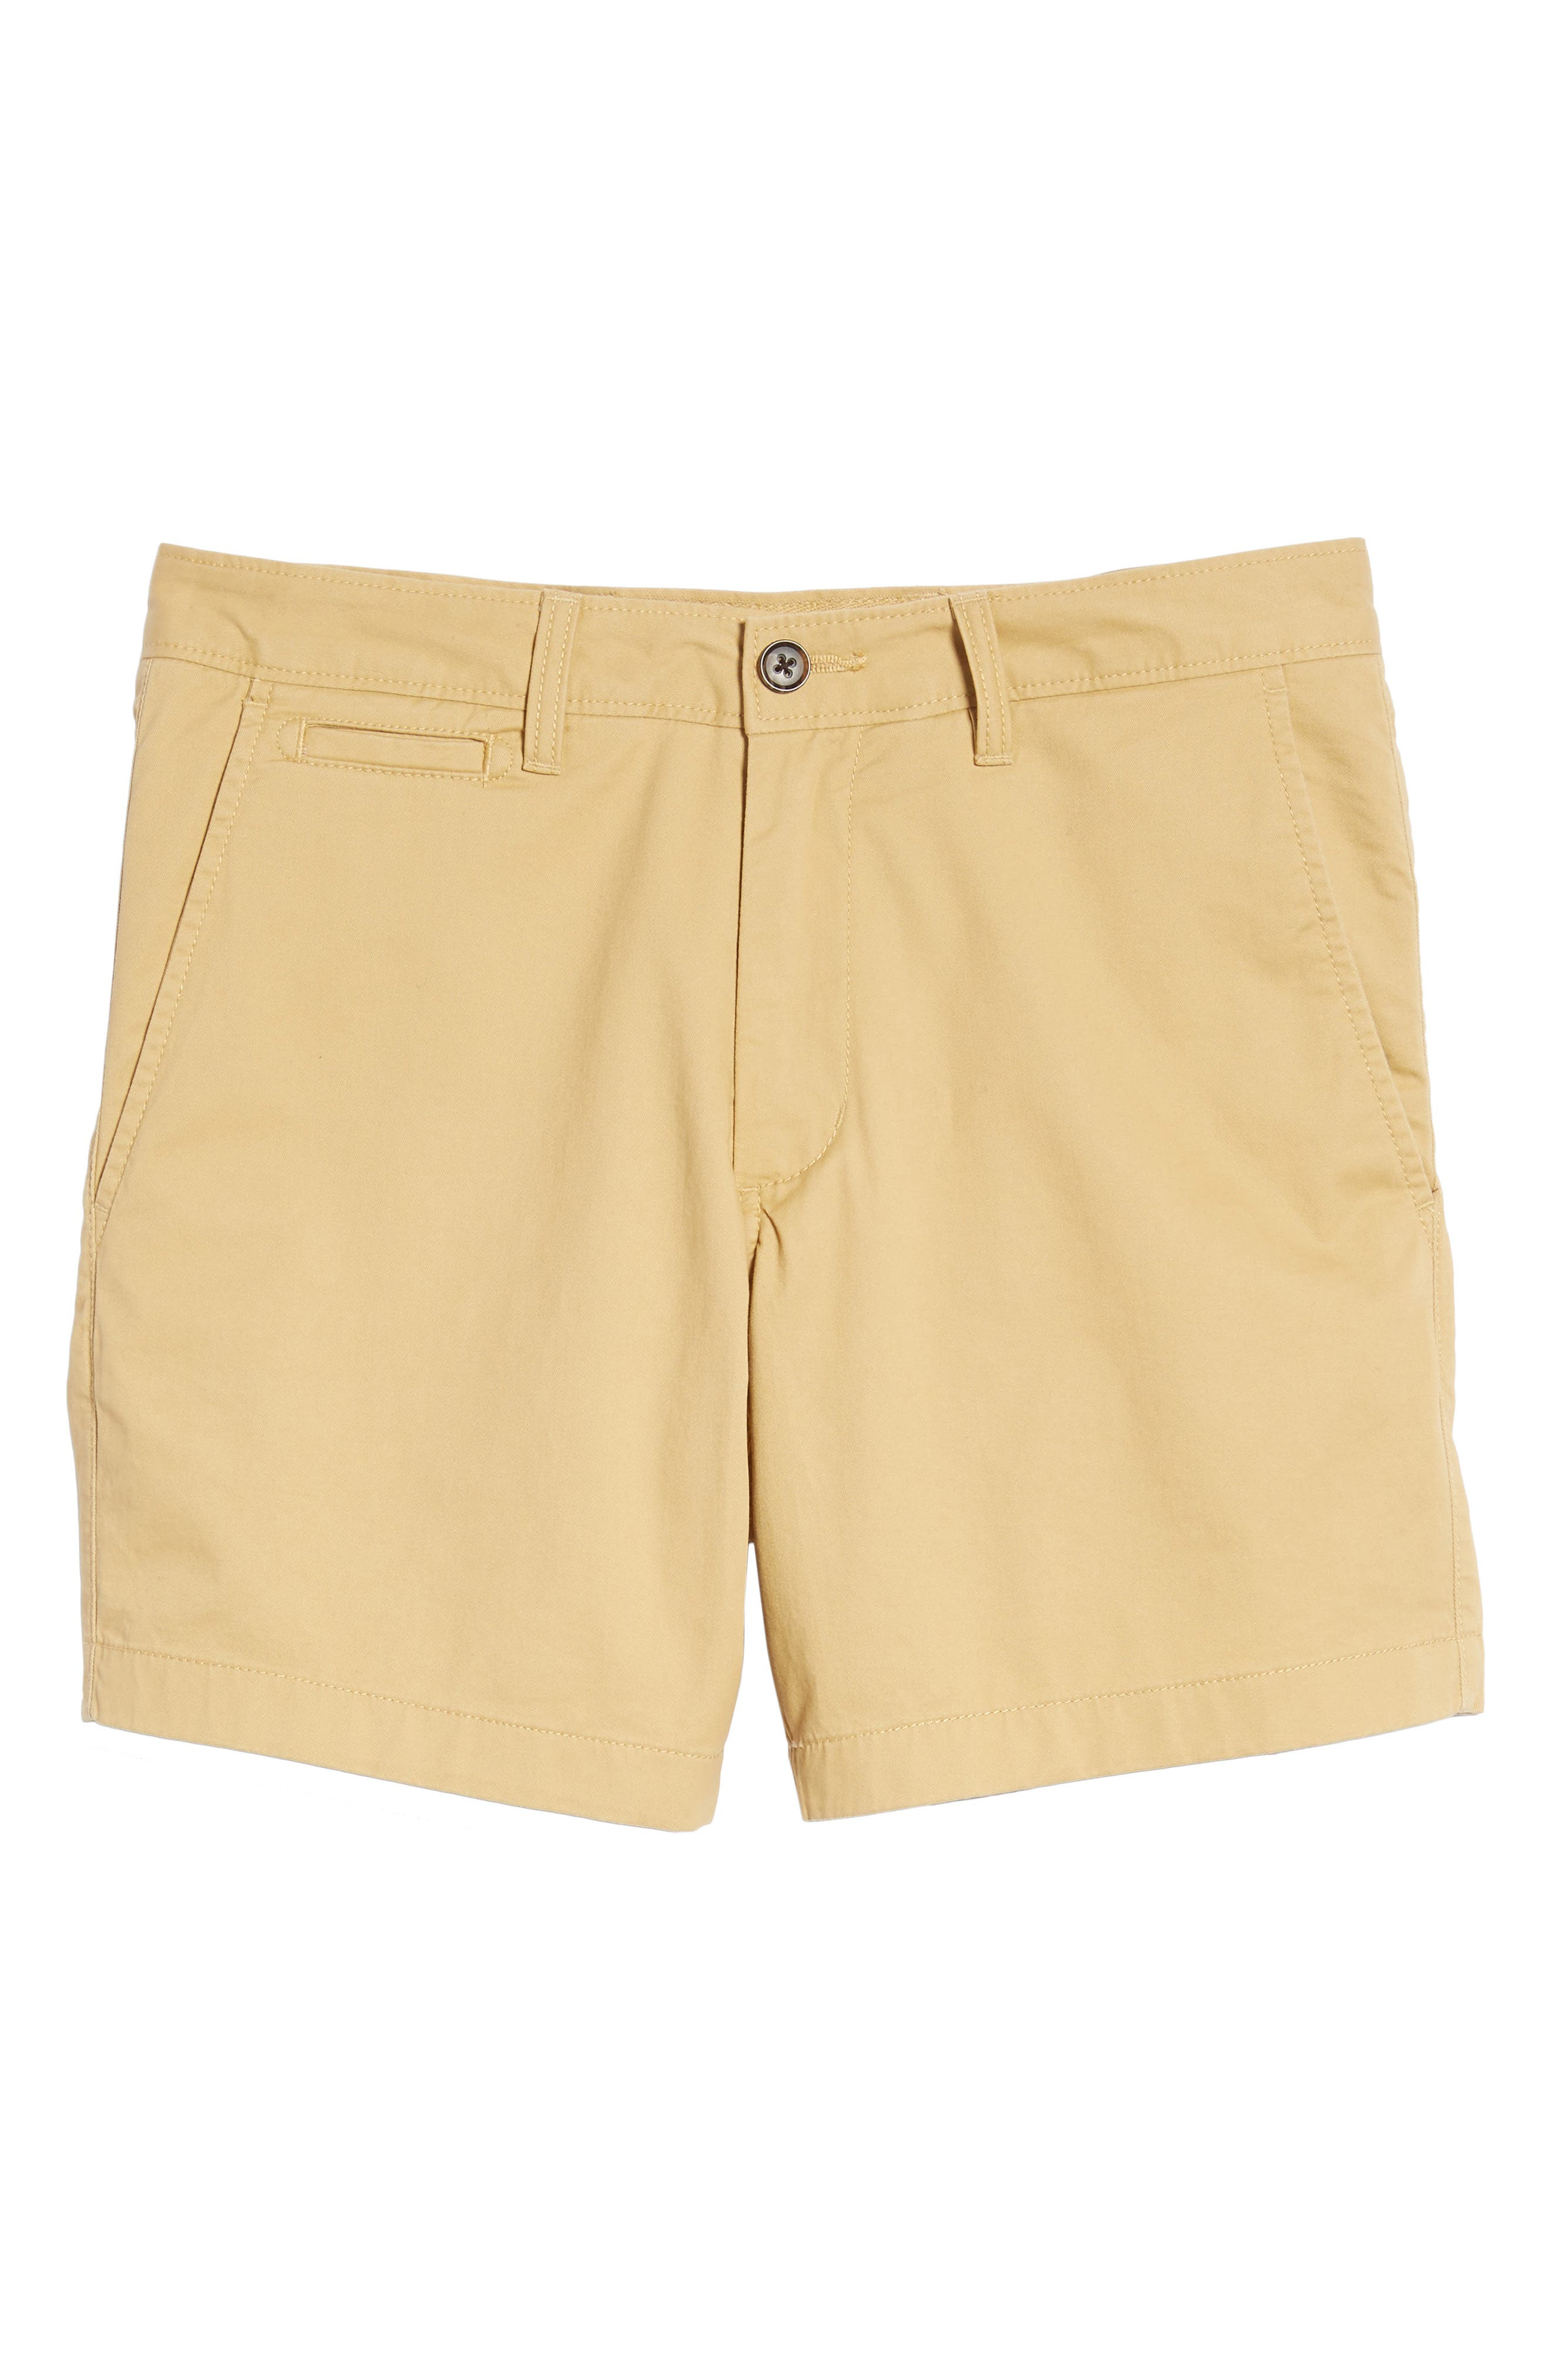 Ballard Slim Fit Stretch Chino 7-Inch Shorts,                             Alternate thumbnail 63, color,